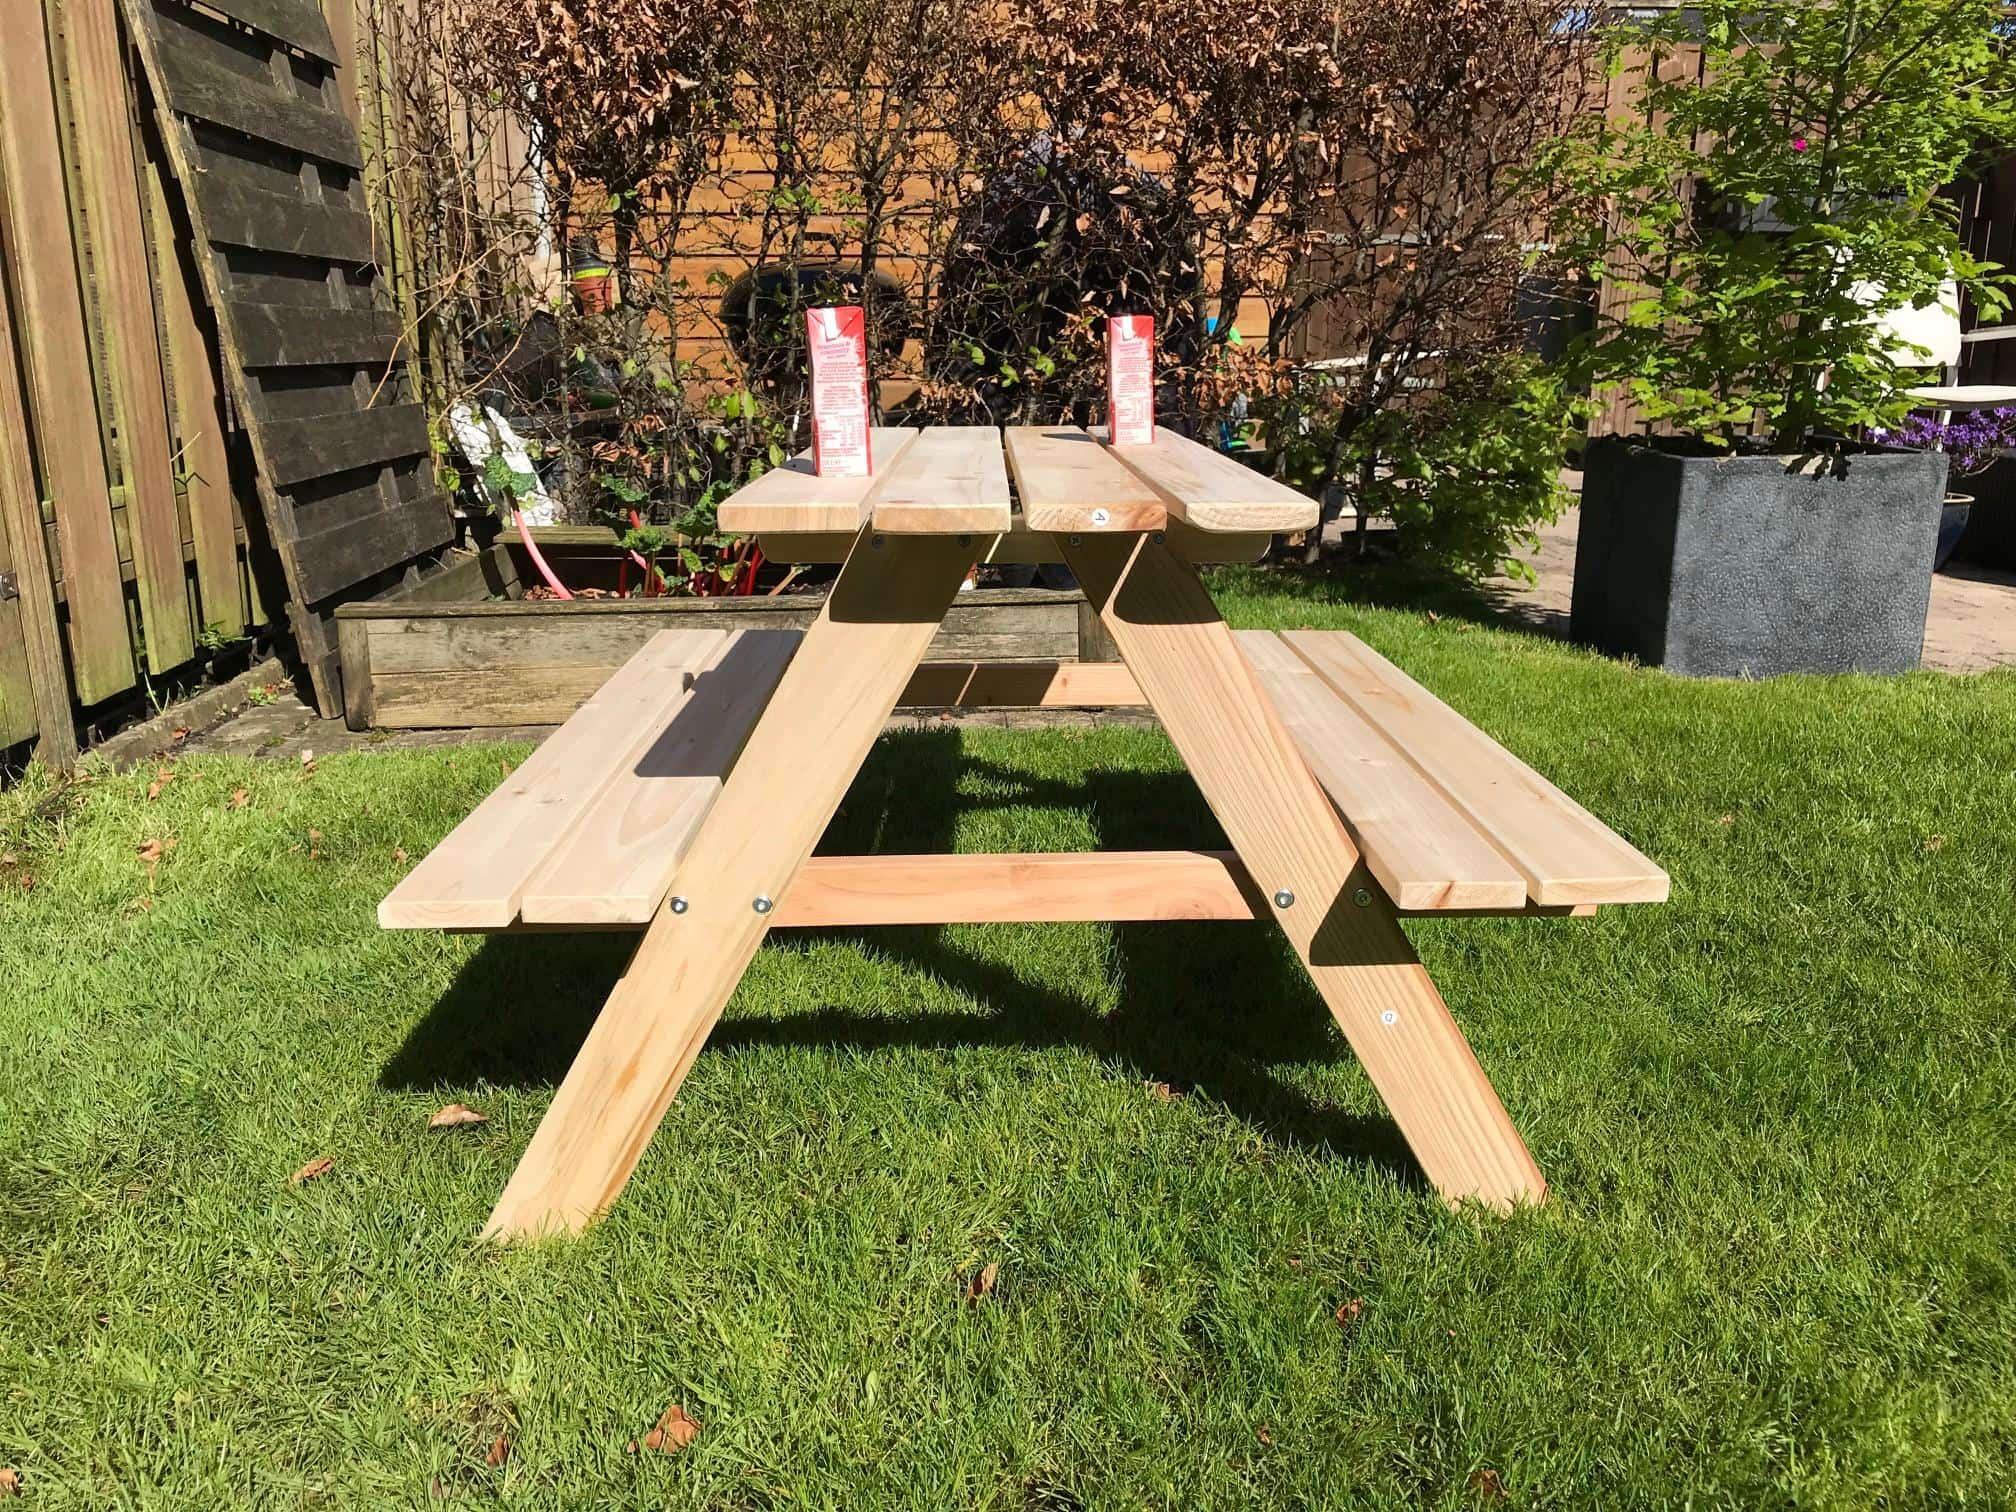 4goodz Houten Kinder Picknicktafel - 89 x 80 x 50cm